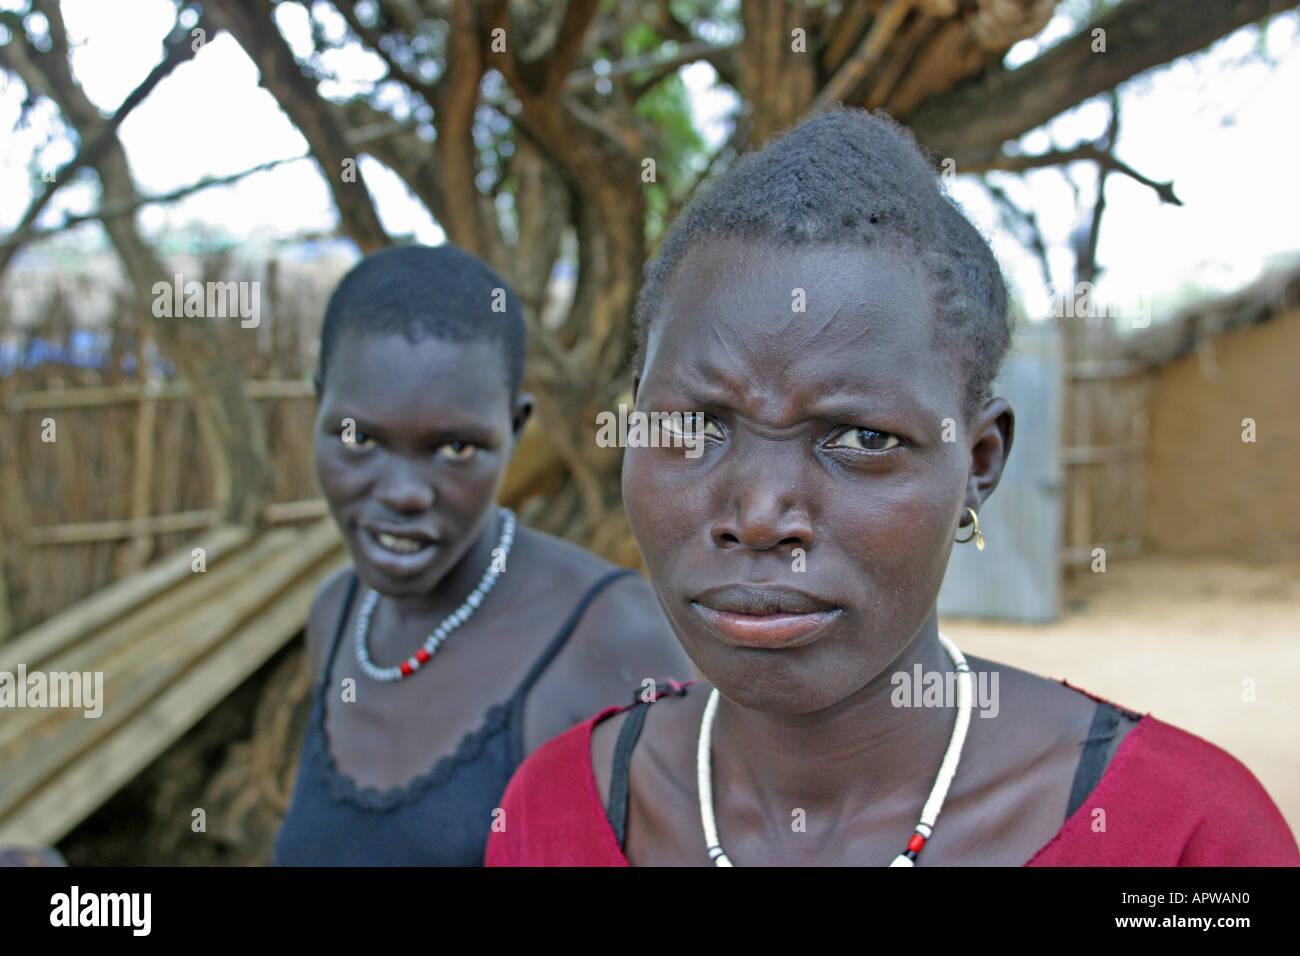 young Dinka women, Sudan - Stock Image